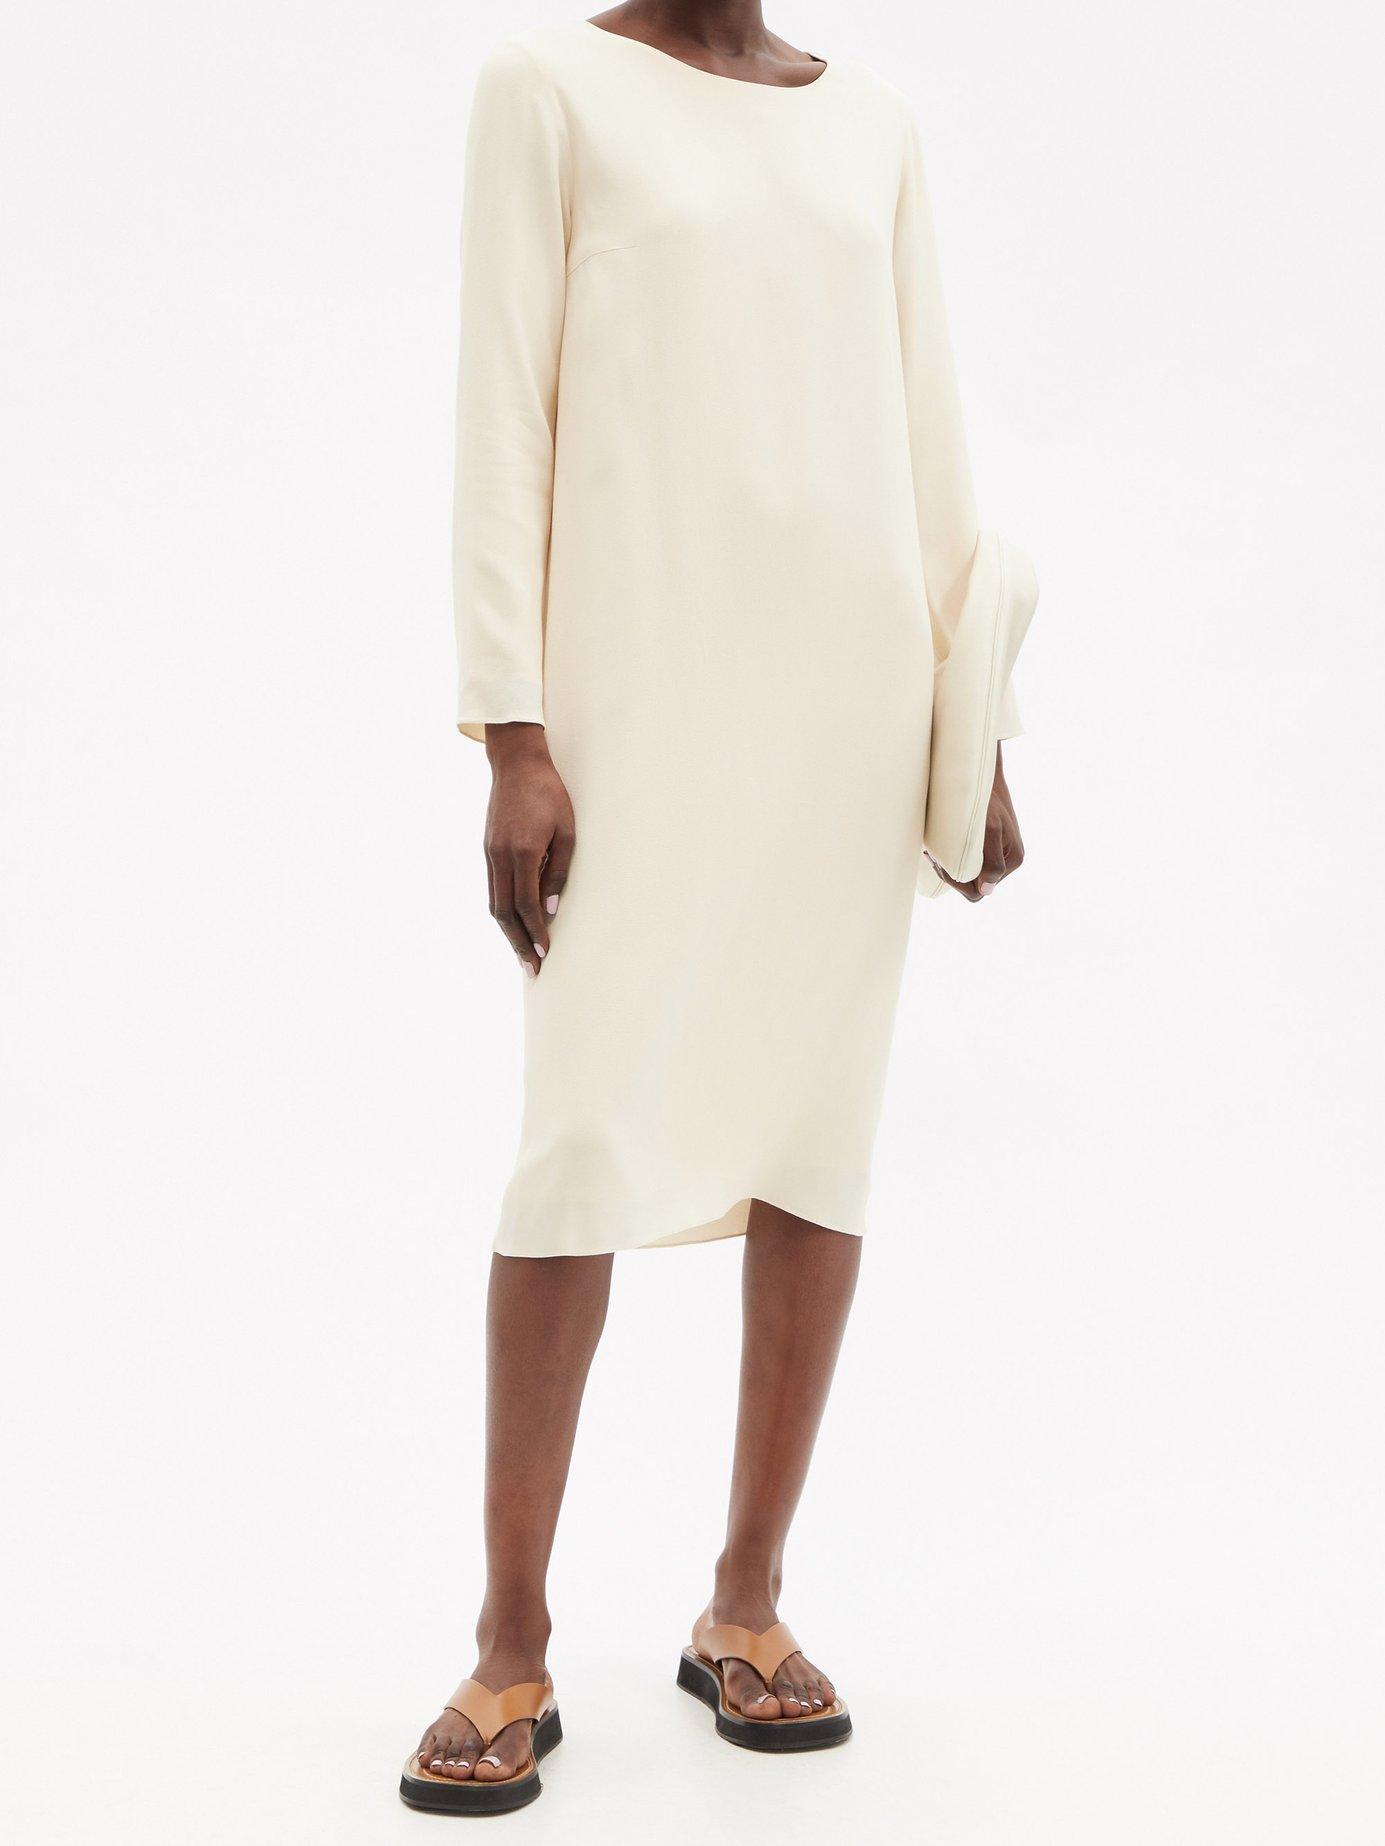 Larina crepe tunic-dress by The Row